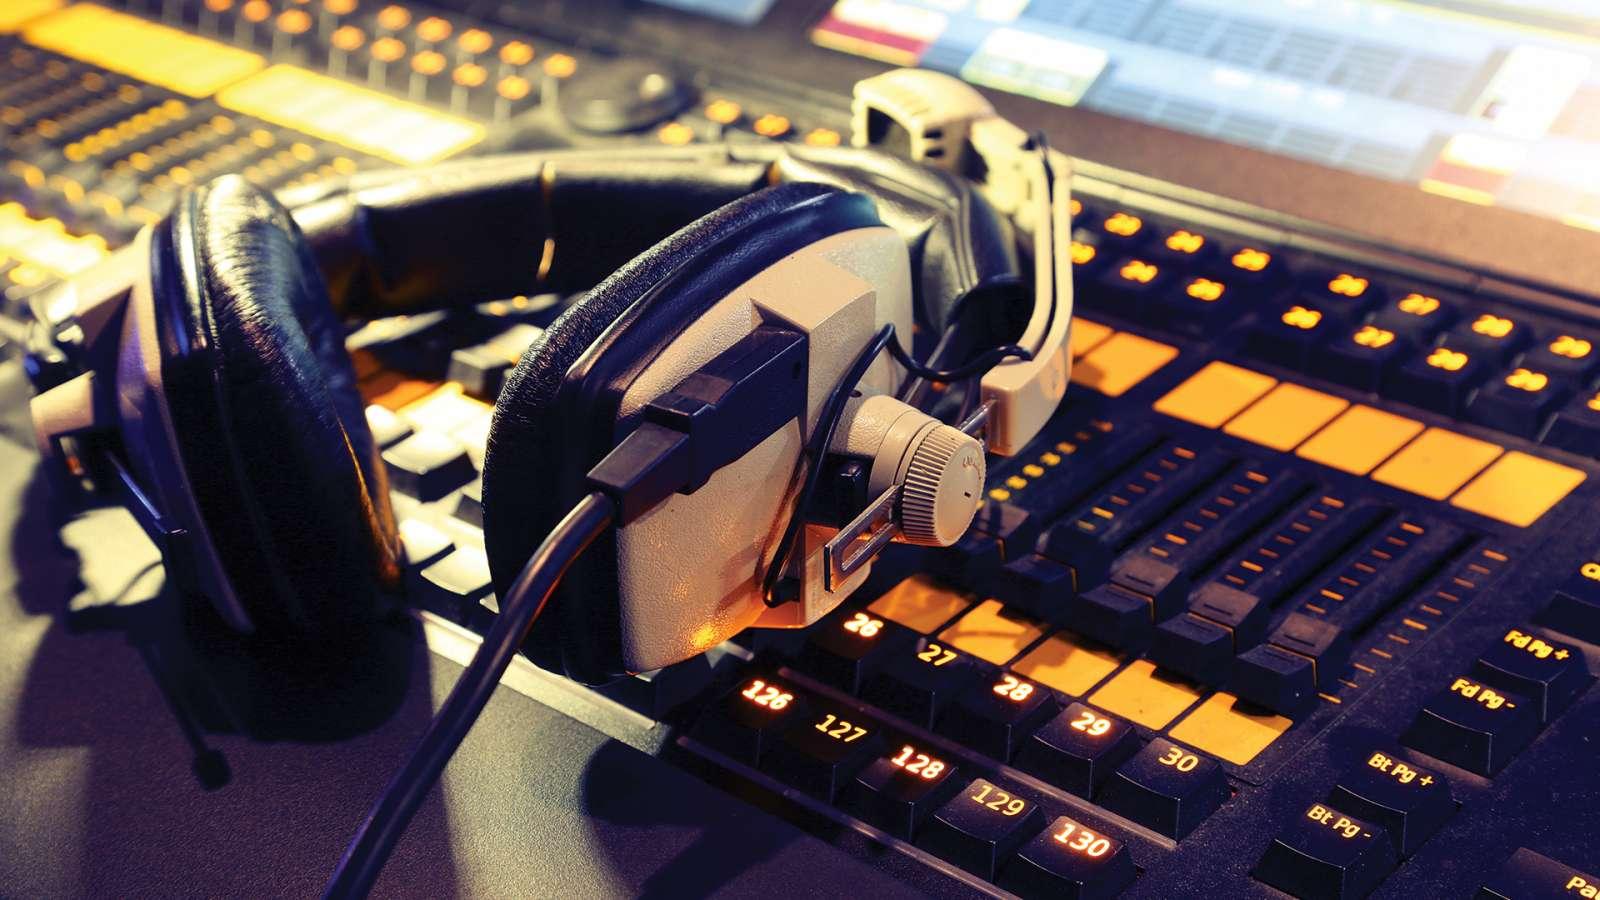 Audio-visual post-production suites